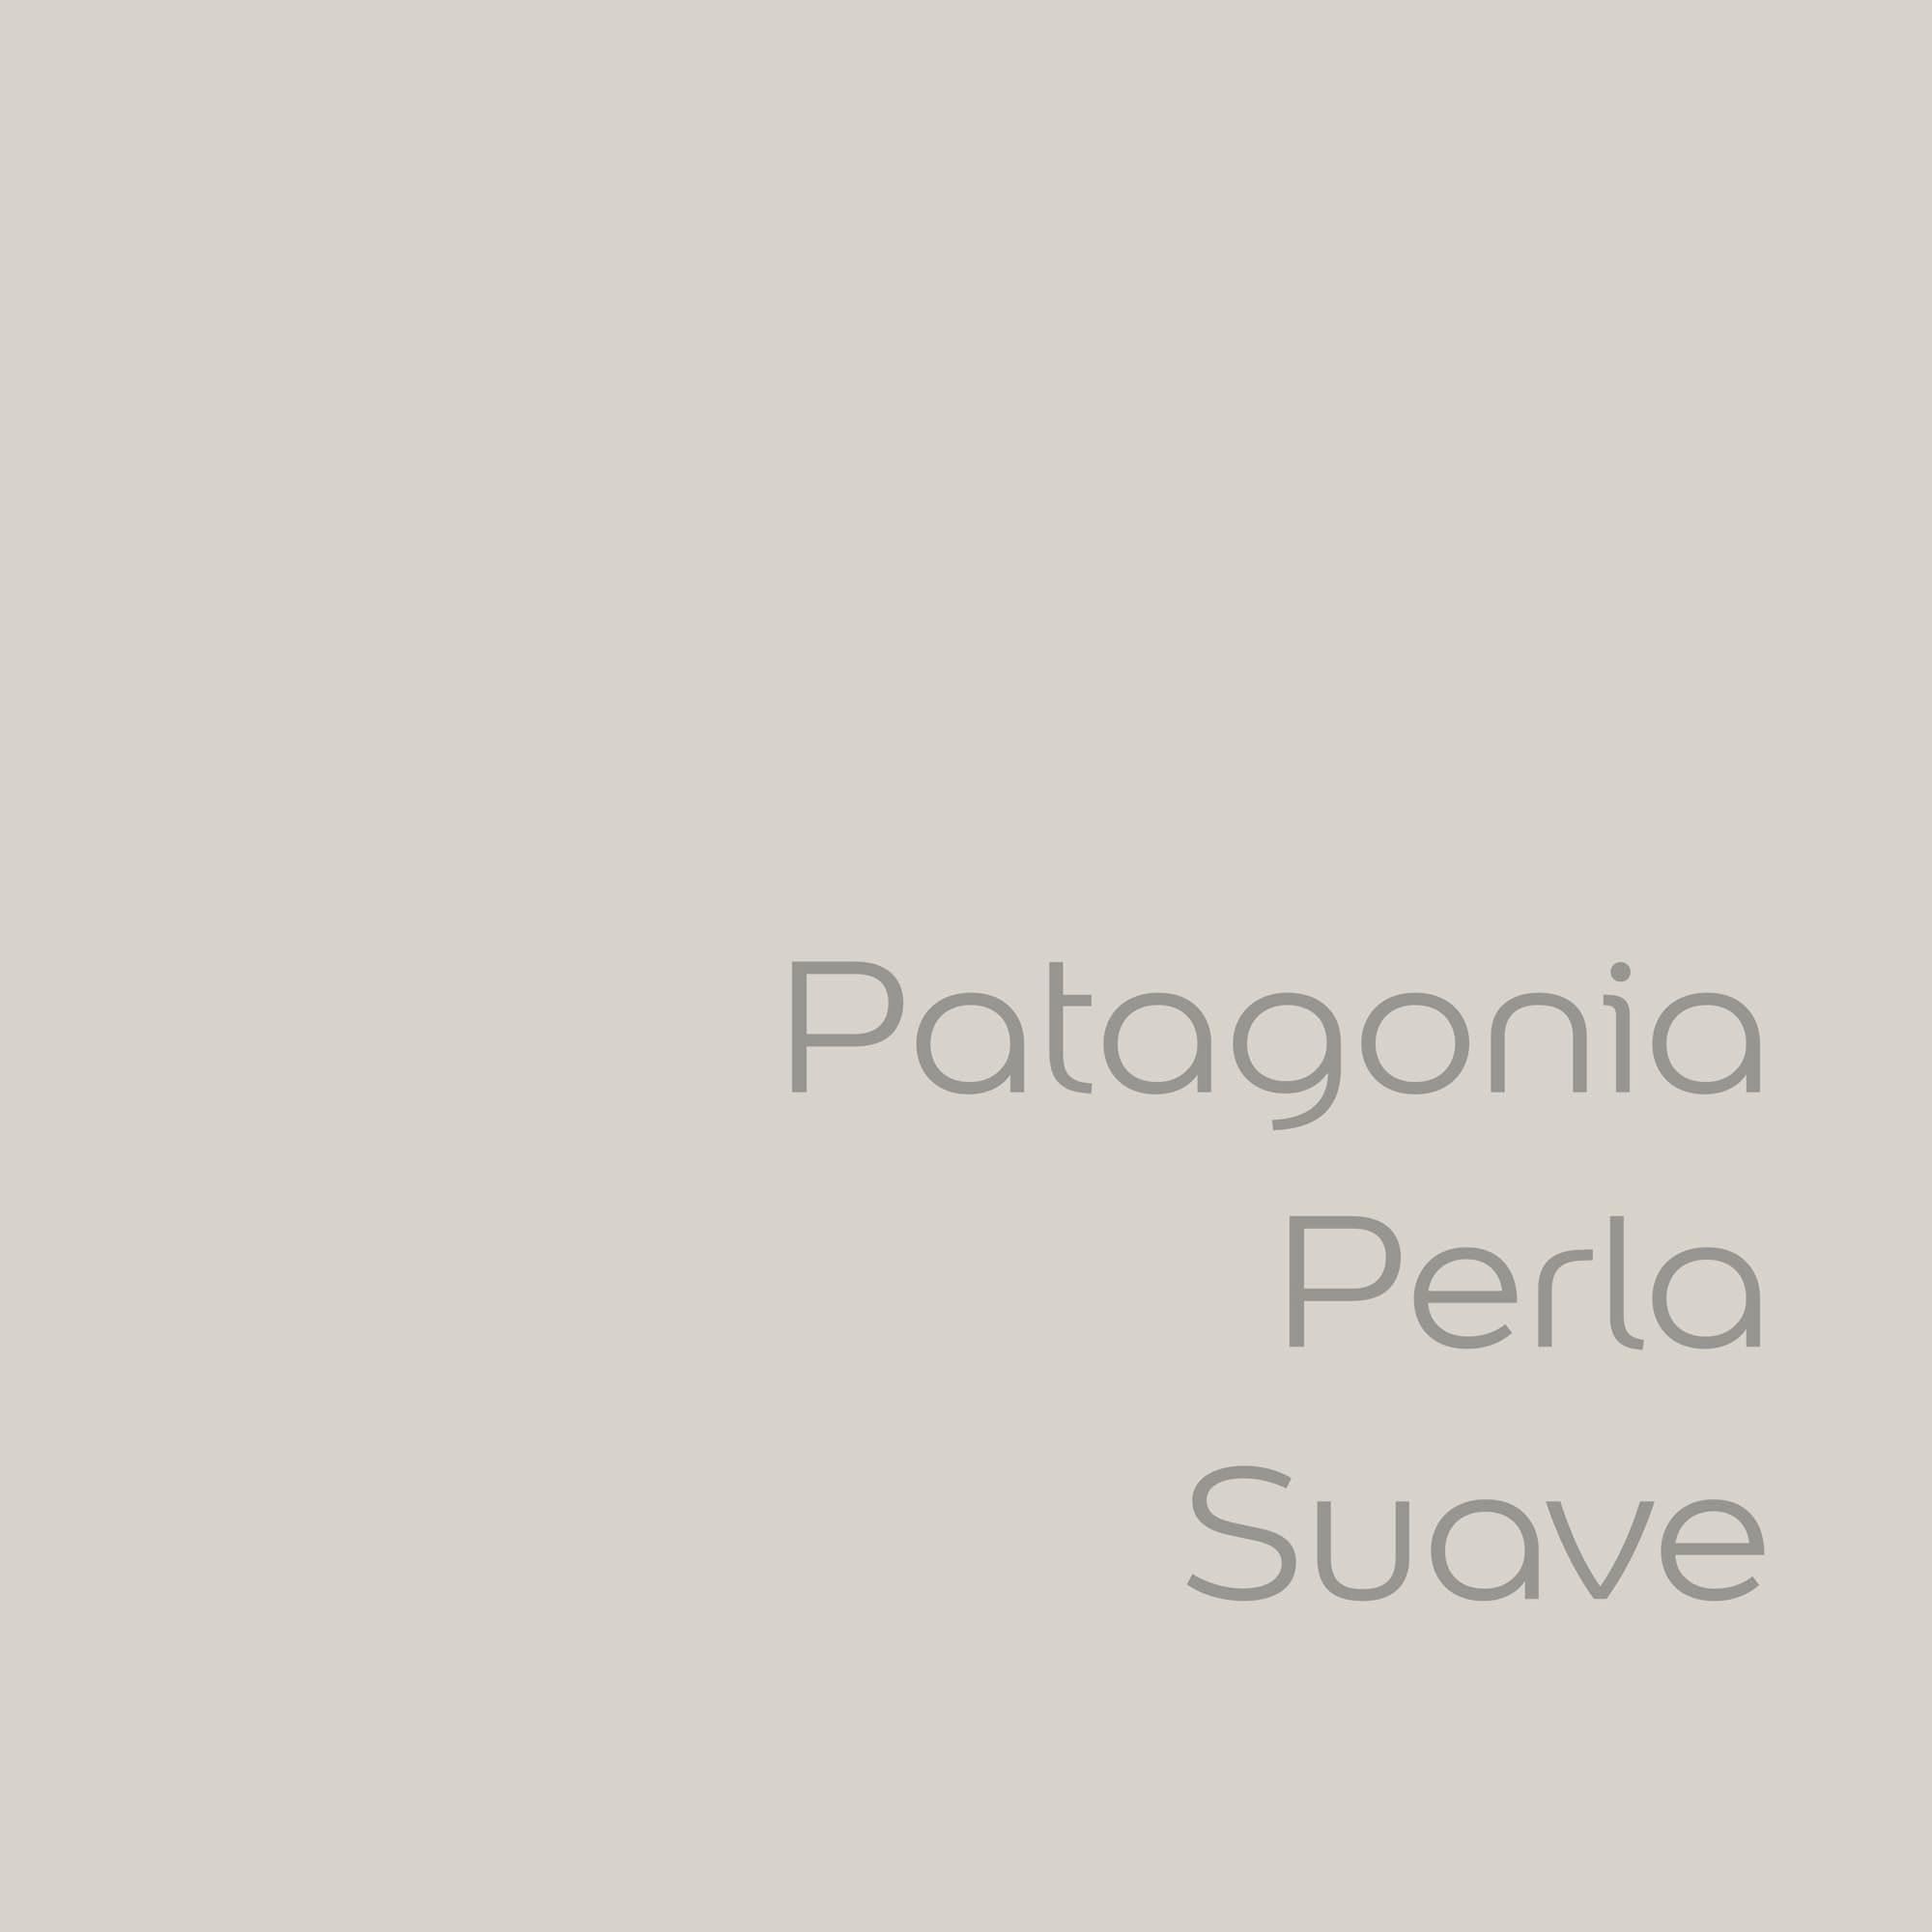 tester de color de pintura bruguer cdm patagonia perla suave color